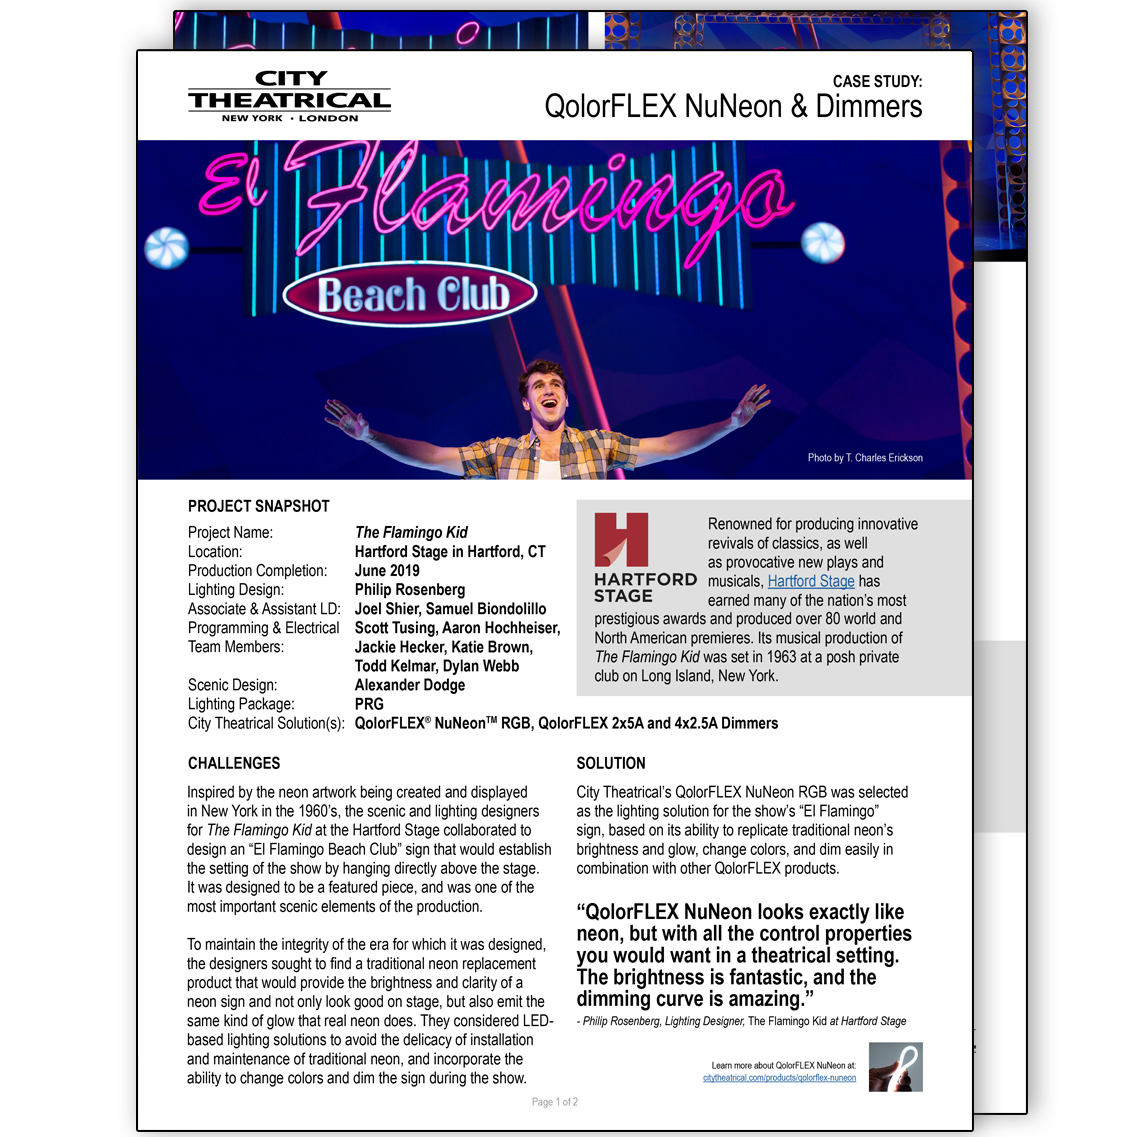 QolorFLEX NuNeon at Hartford Stage case study